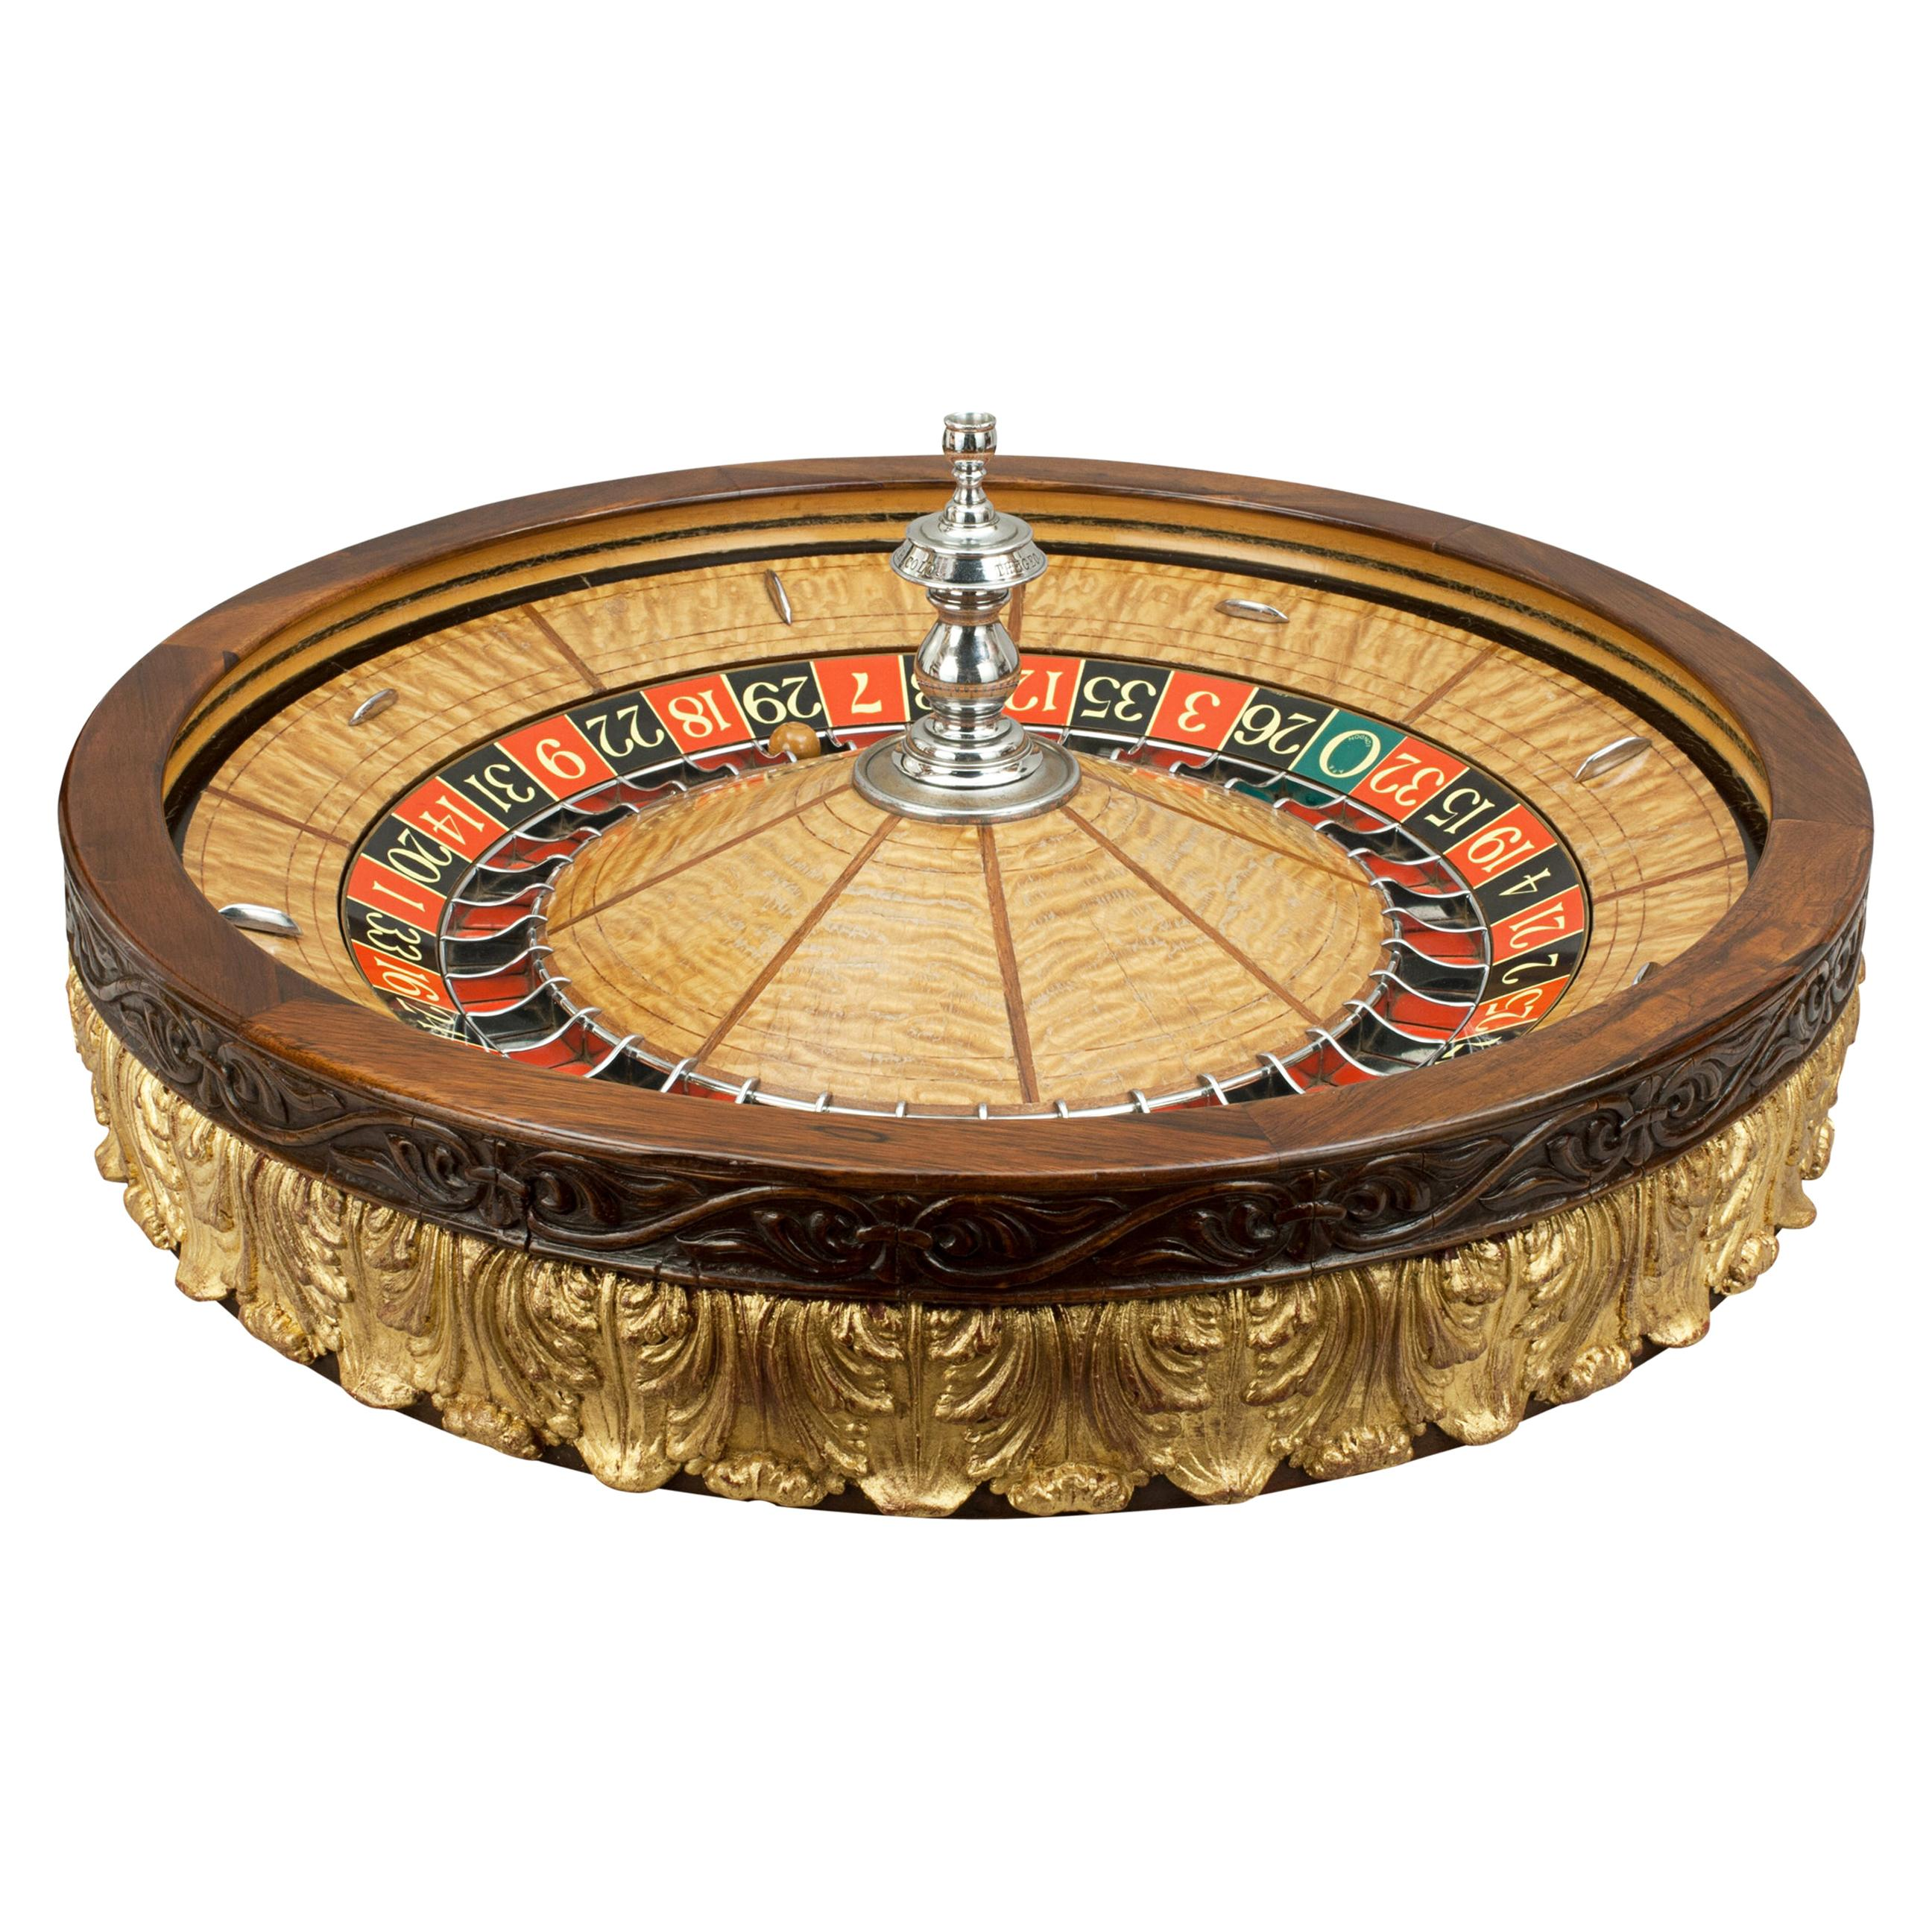 Antique Casino Roulette Wheel, George Mason Co. Denver Colorado